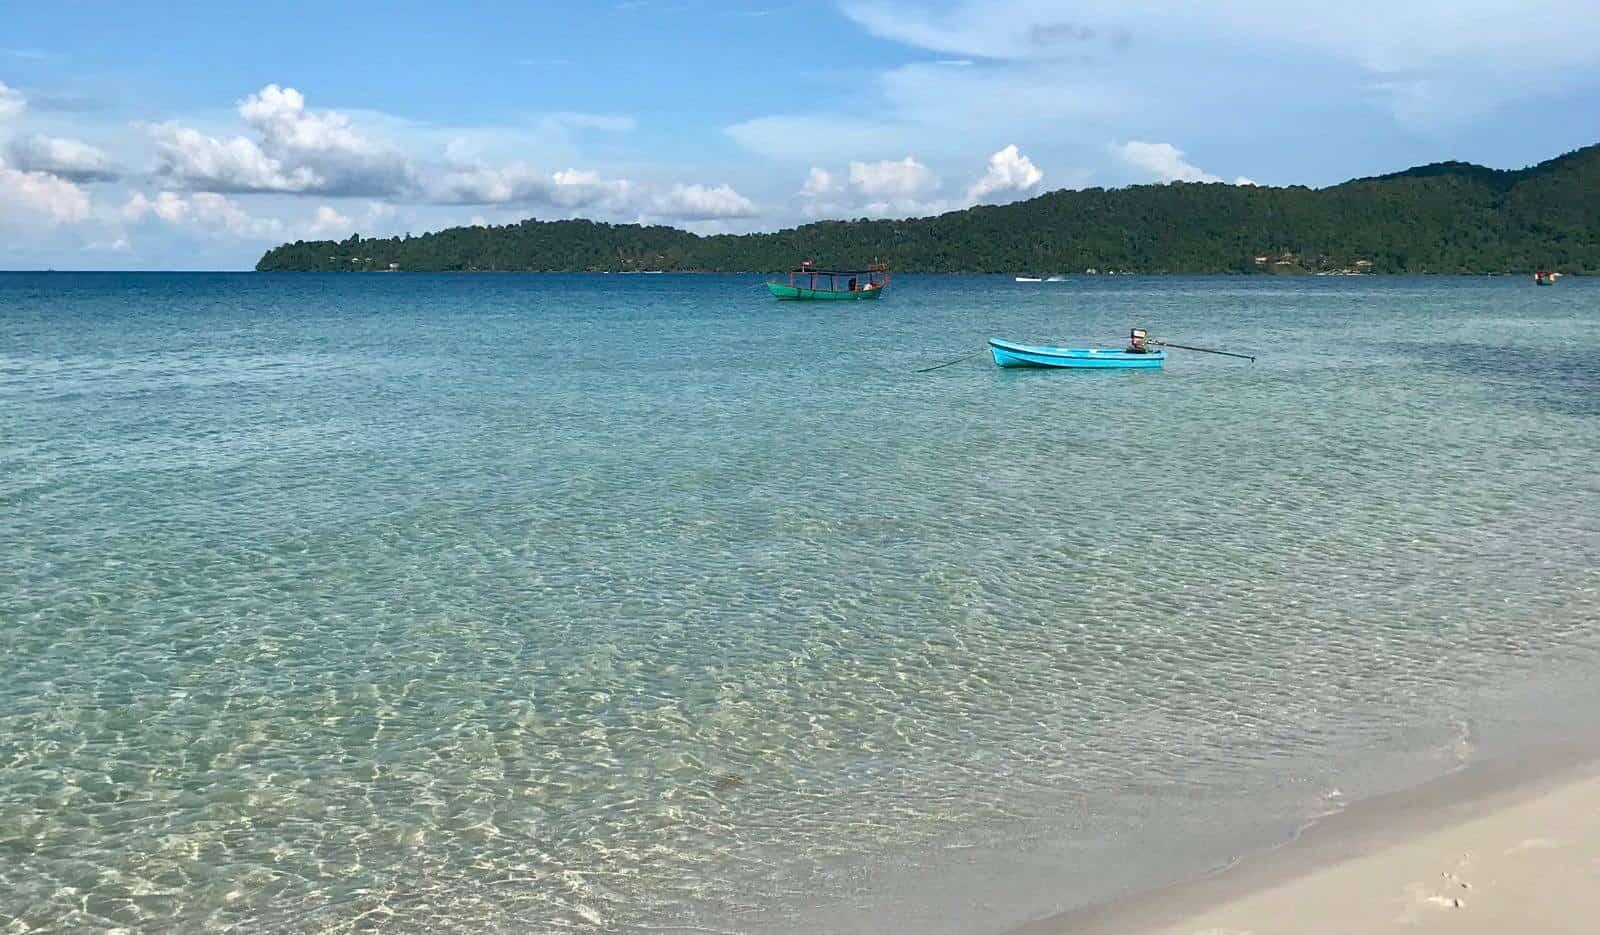 Calm Seas Koh Rong Sanloem Cambodia betternotstop